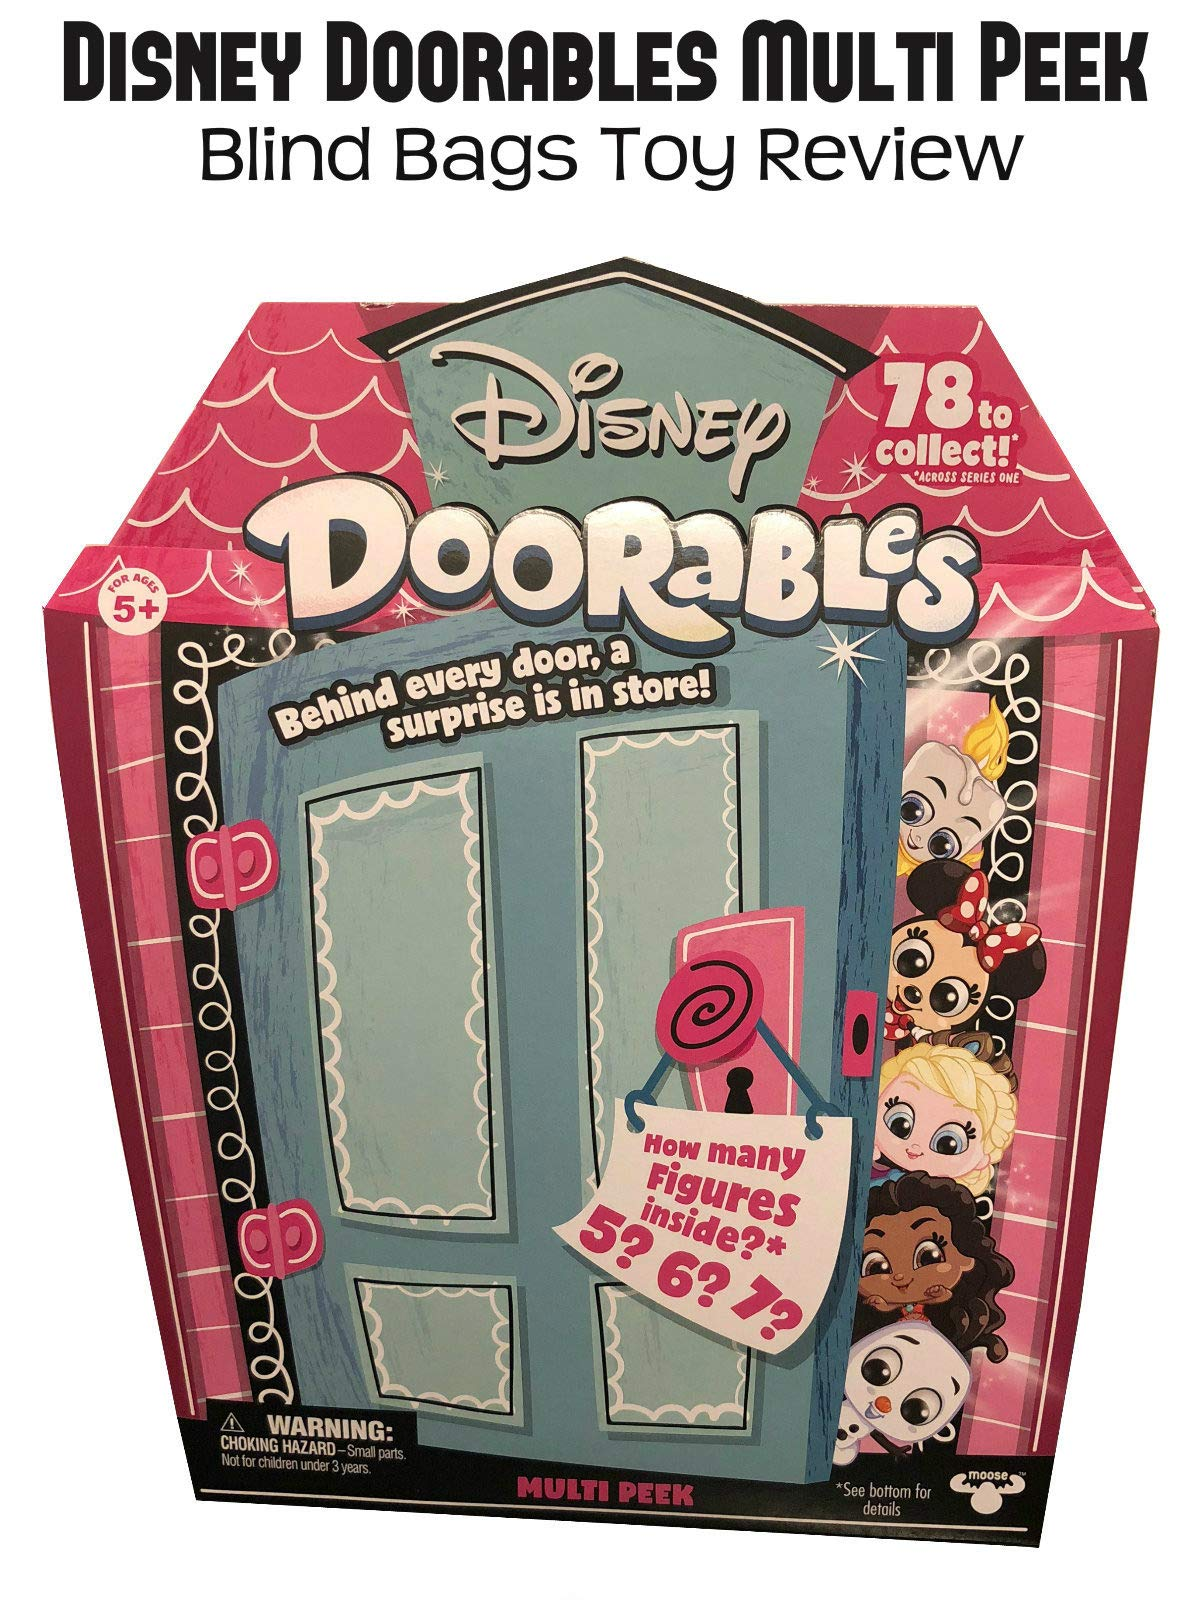 Review: Disney Doorables Multi Peek Blind Bags Toy Review on Amazon Prime Video UK